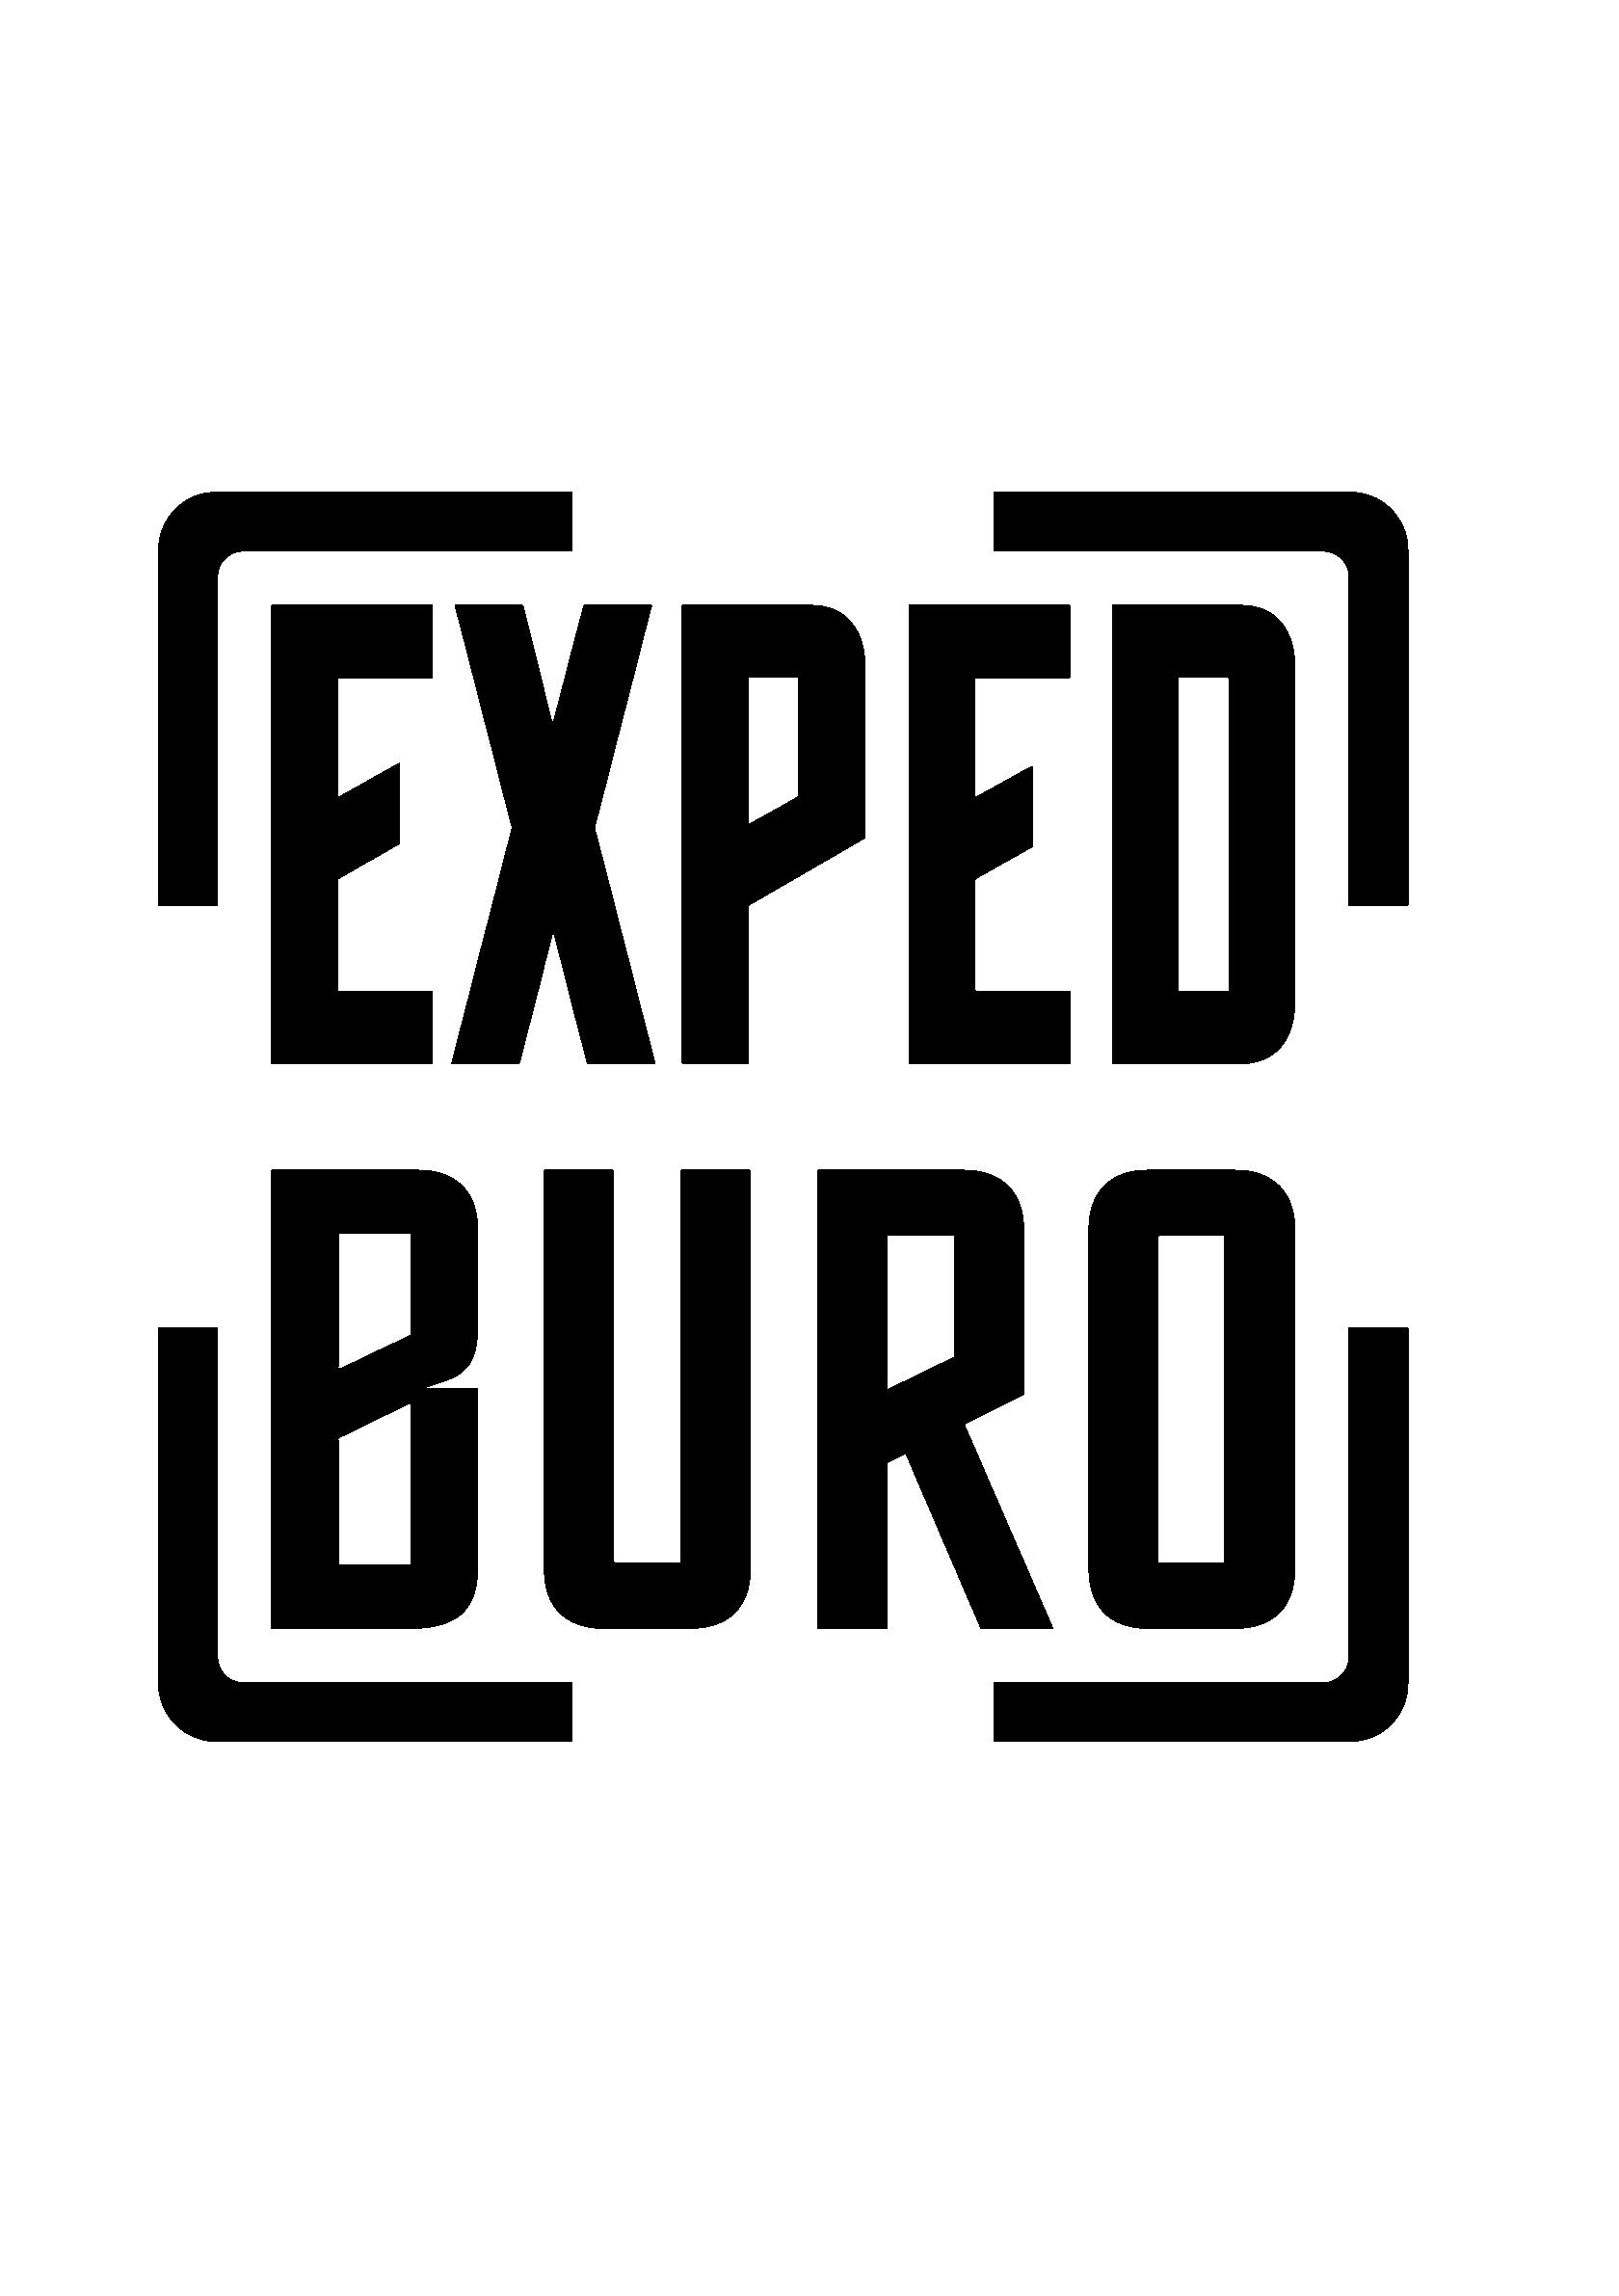 EXPEDBURO